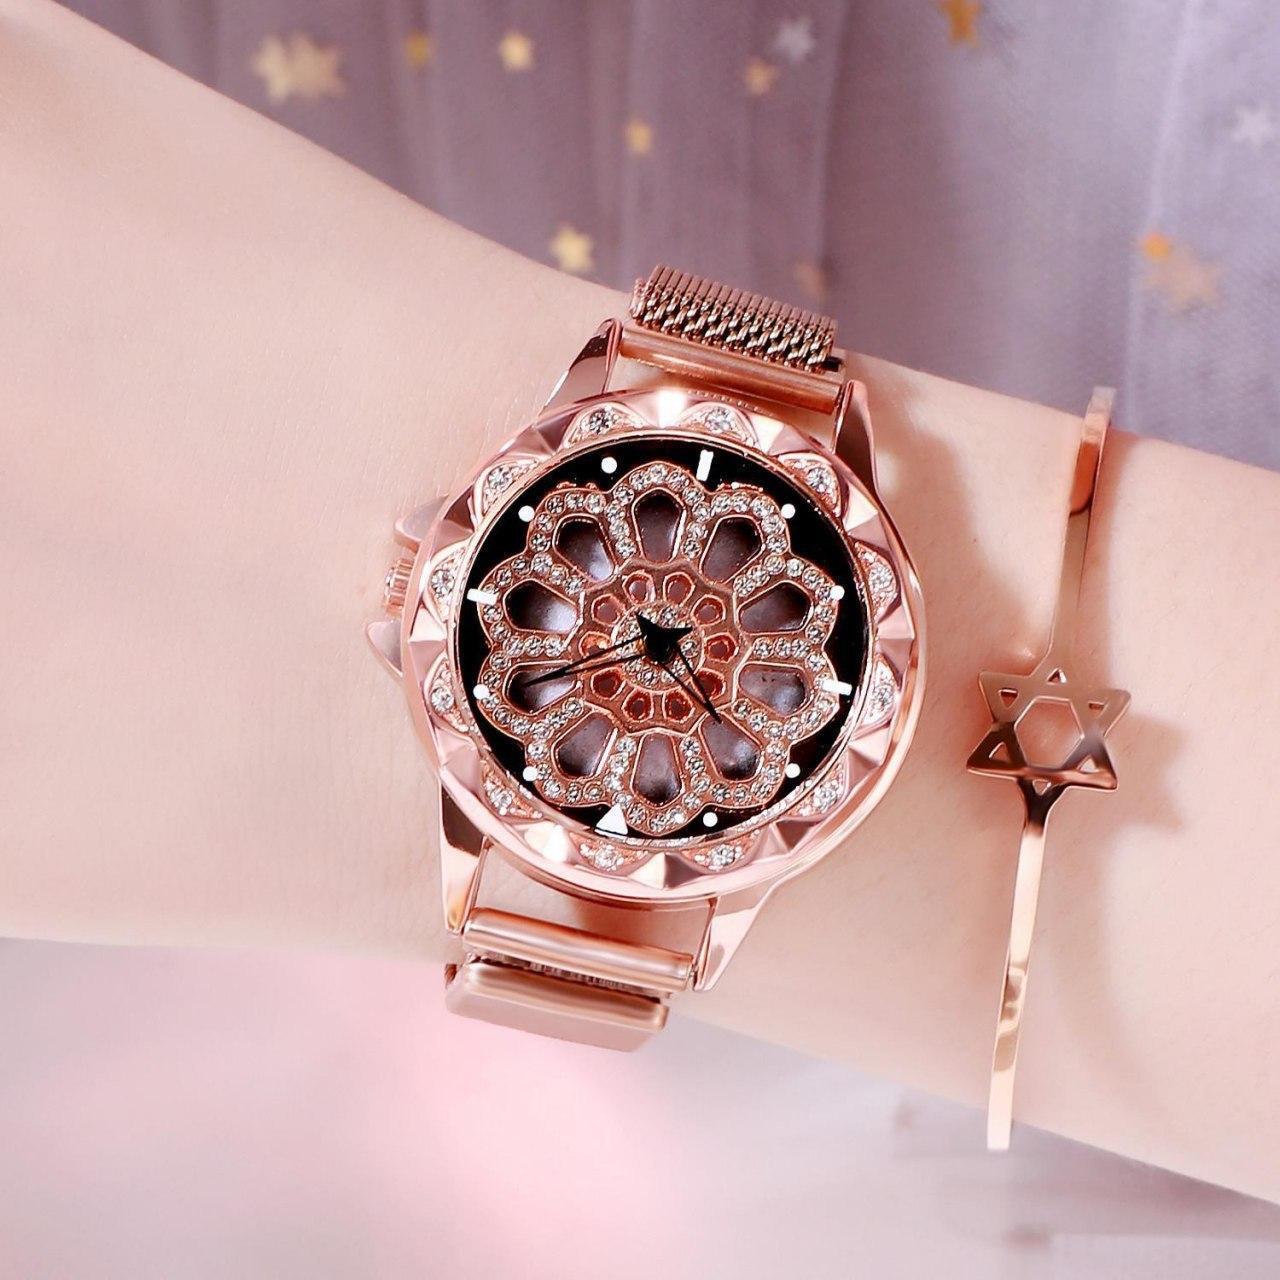 "Часы с крутящимся циферблатом ""Flower Diamond Rotation Watch"